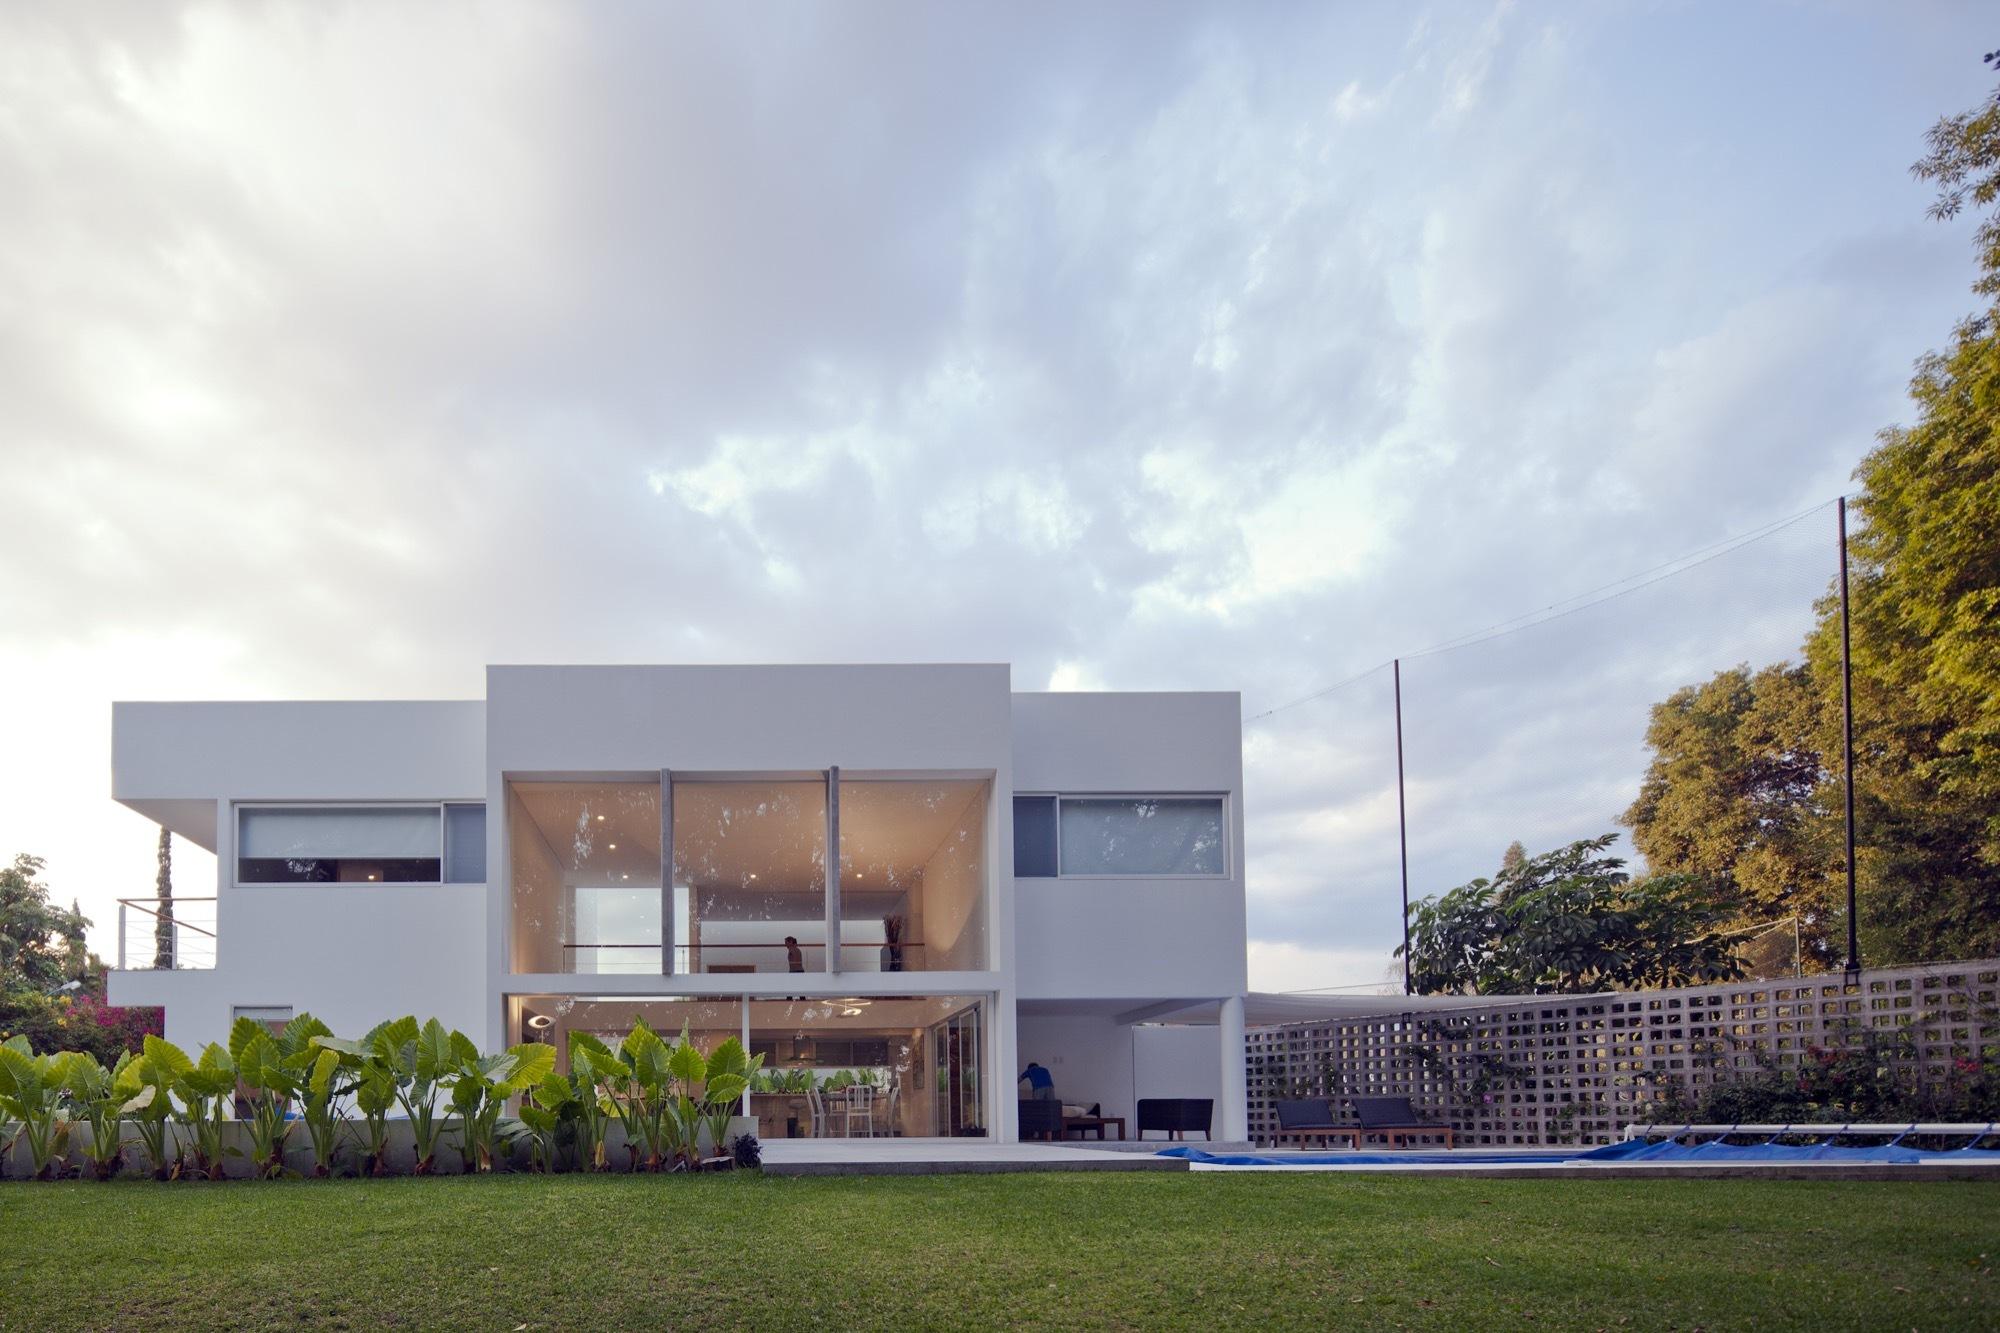 Galer a de casa tulipanes estudio fi arquitectos 3 - Estudio 3 arquitectos ...